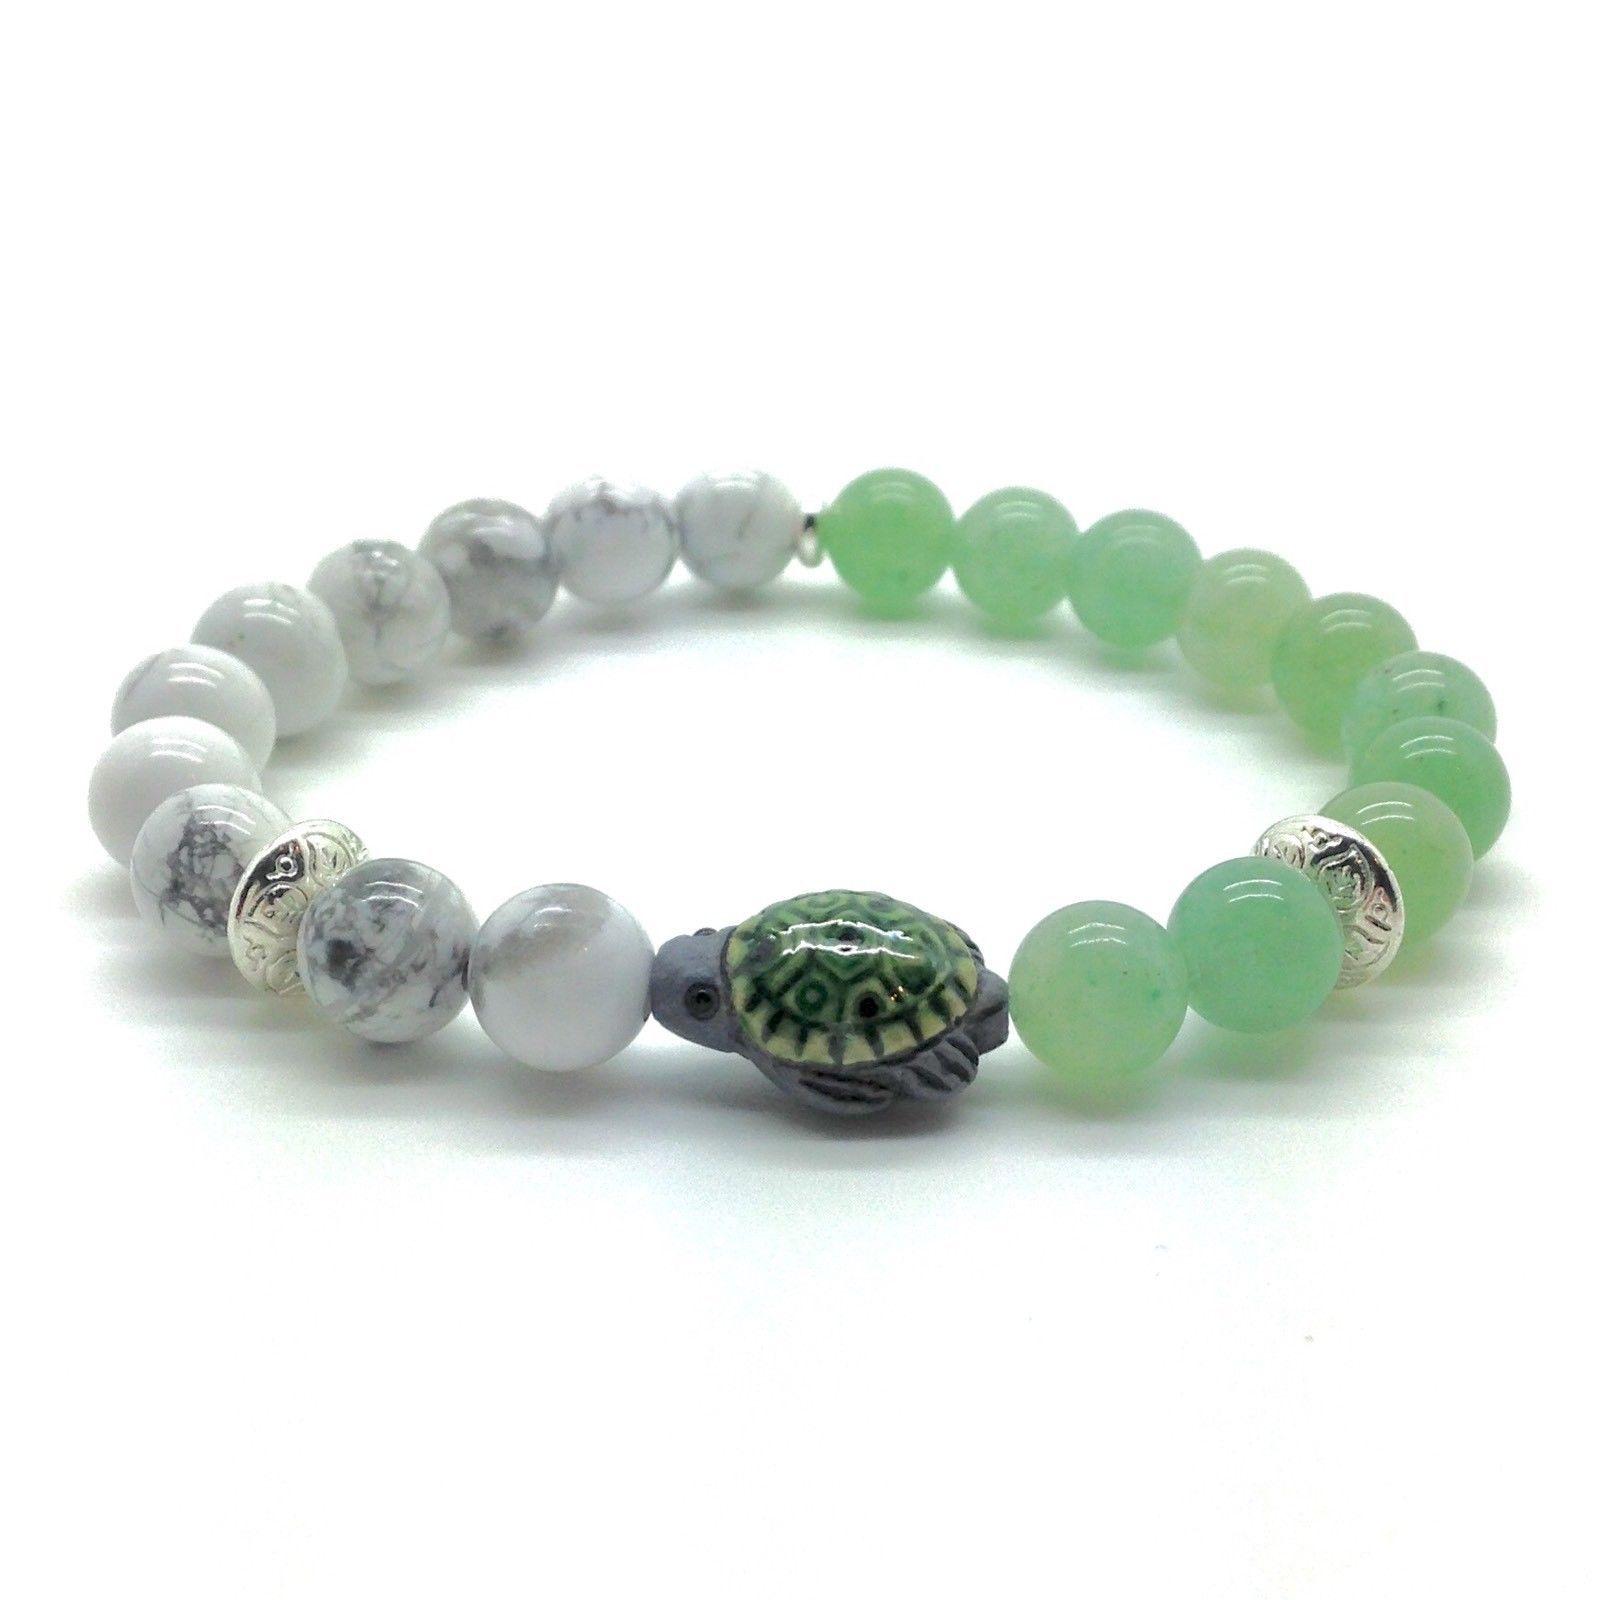 a95ac6e894 Sea Turtle Bracelet Natural Green Aventurine & White Howlite Stone Bead